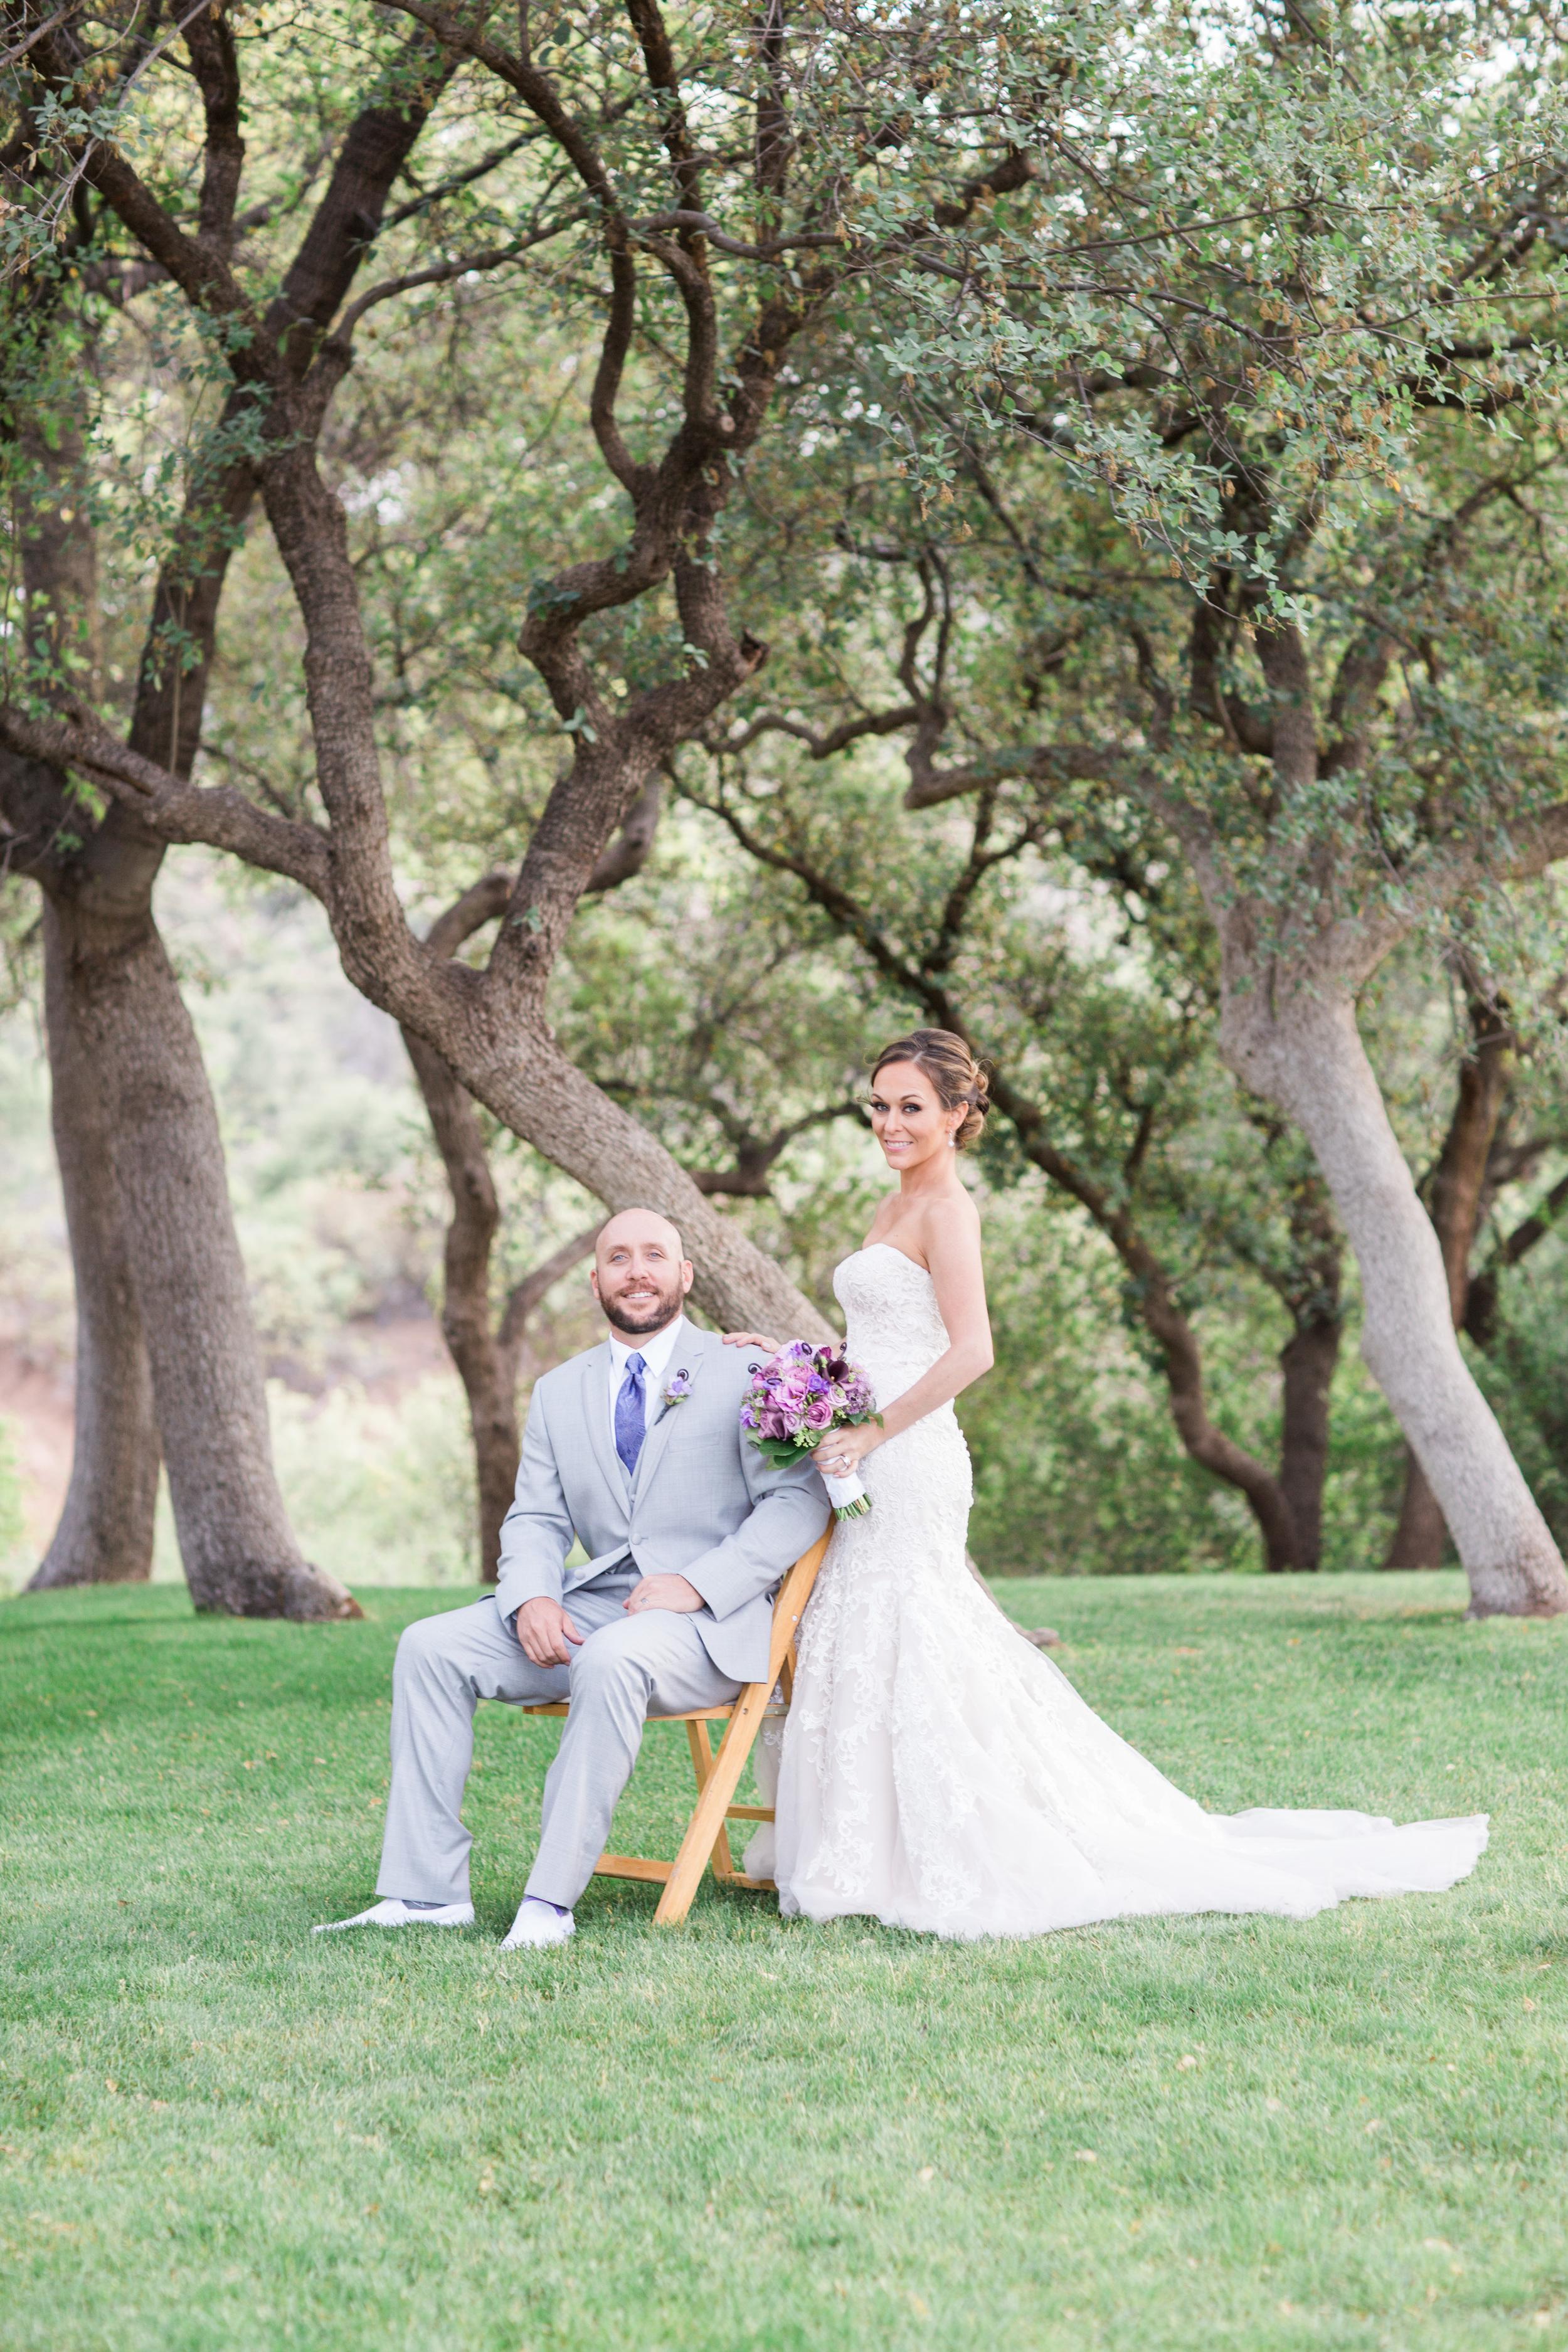 Van Dickson Ranch Wedding   Prescott Wedding Photographers   See more at BetsyandJohn.com